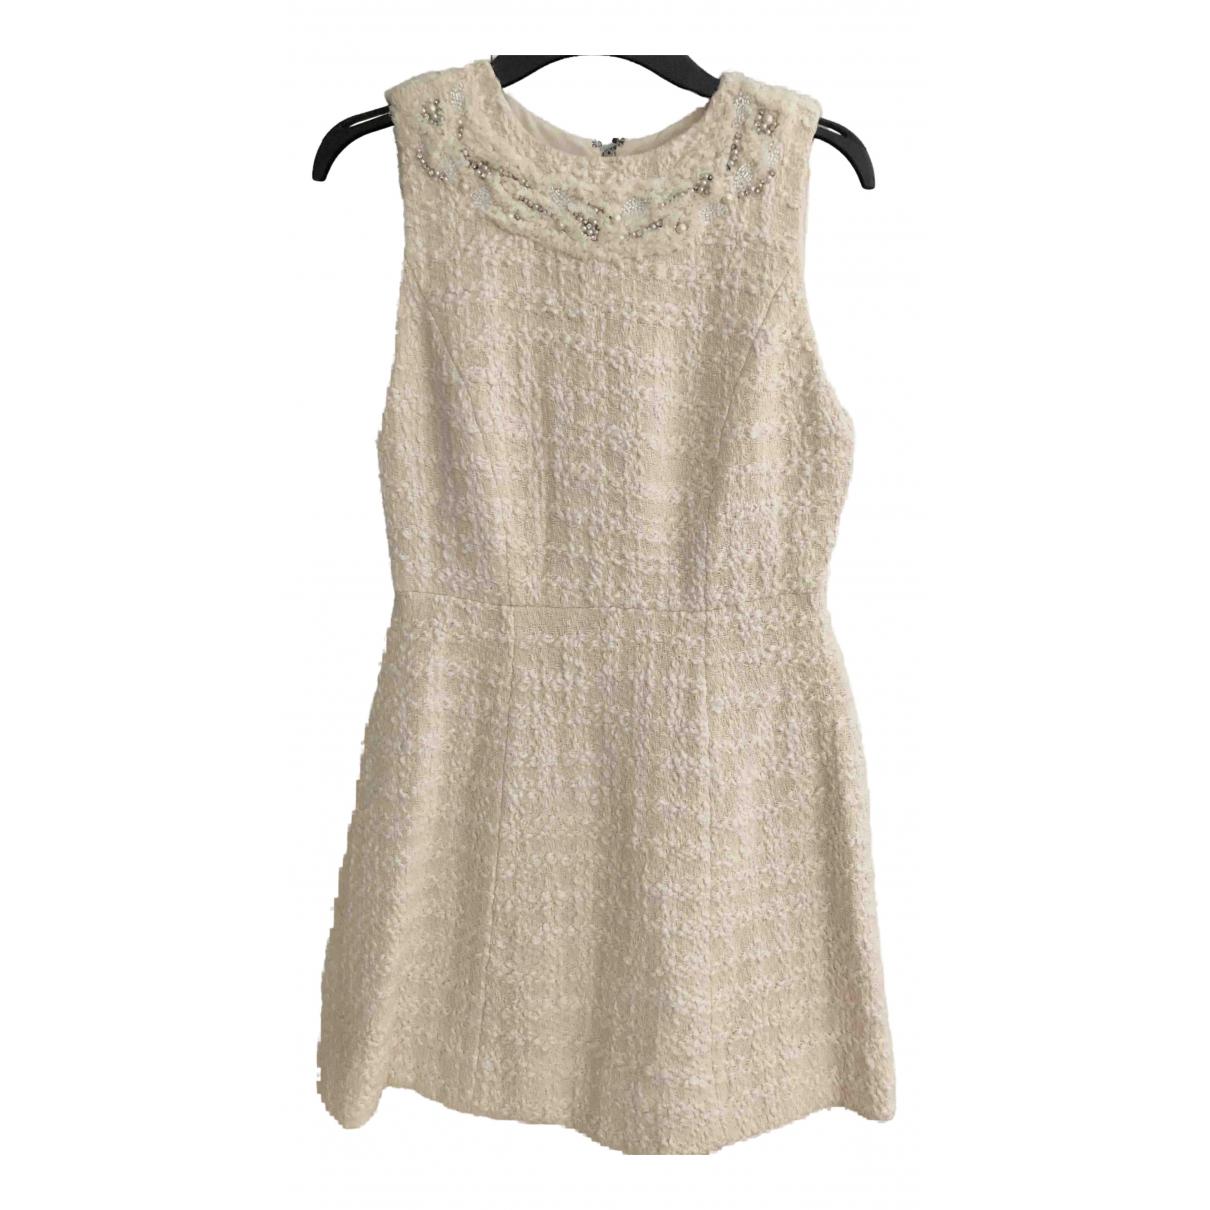 Alice & Olivia N White Cotton dress for Women 4 US